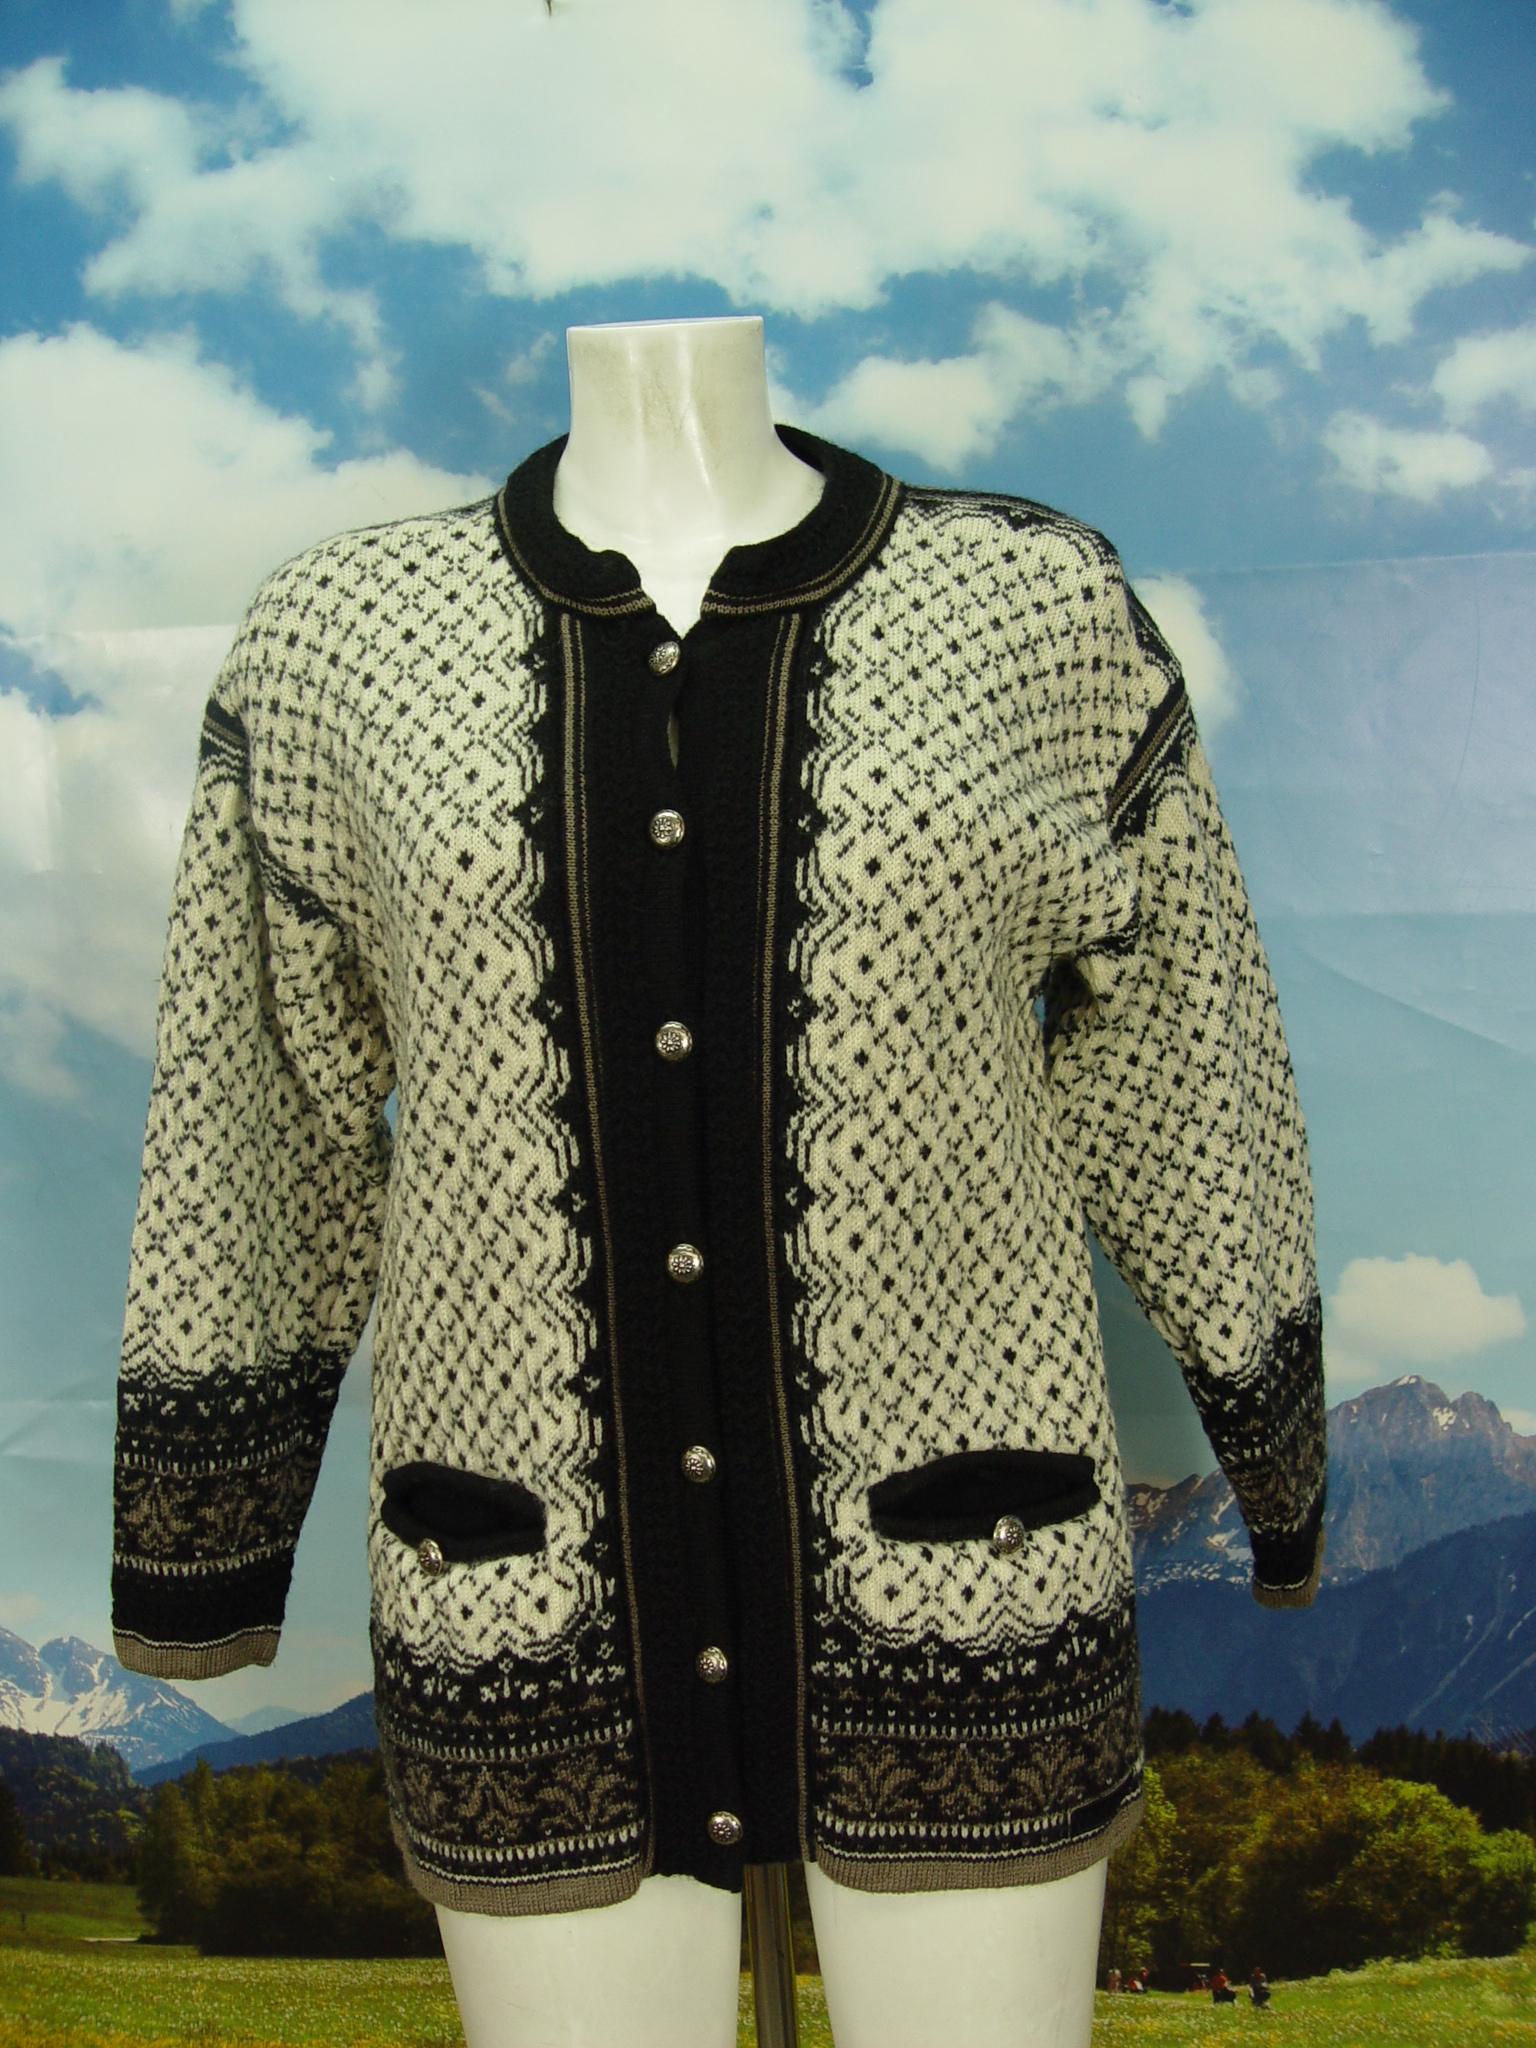 58030d372d6707 neuwertig Damen und Herren CASUAL NORDSTRIKK Norweger Strickjacke Jacke Gr. 40